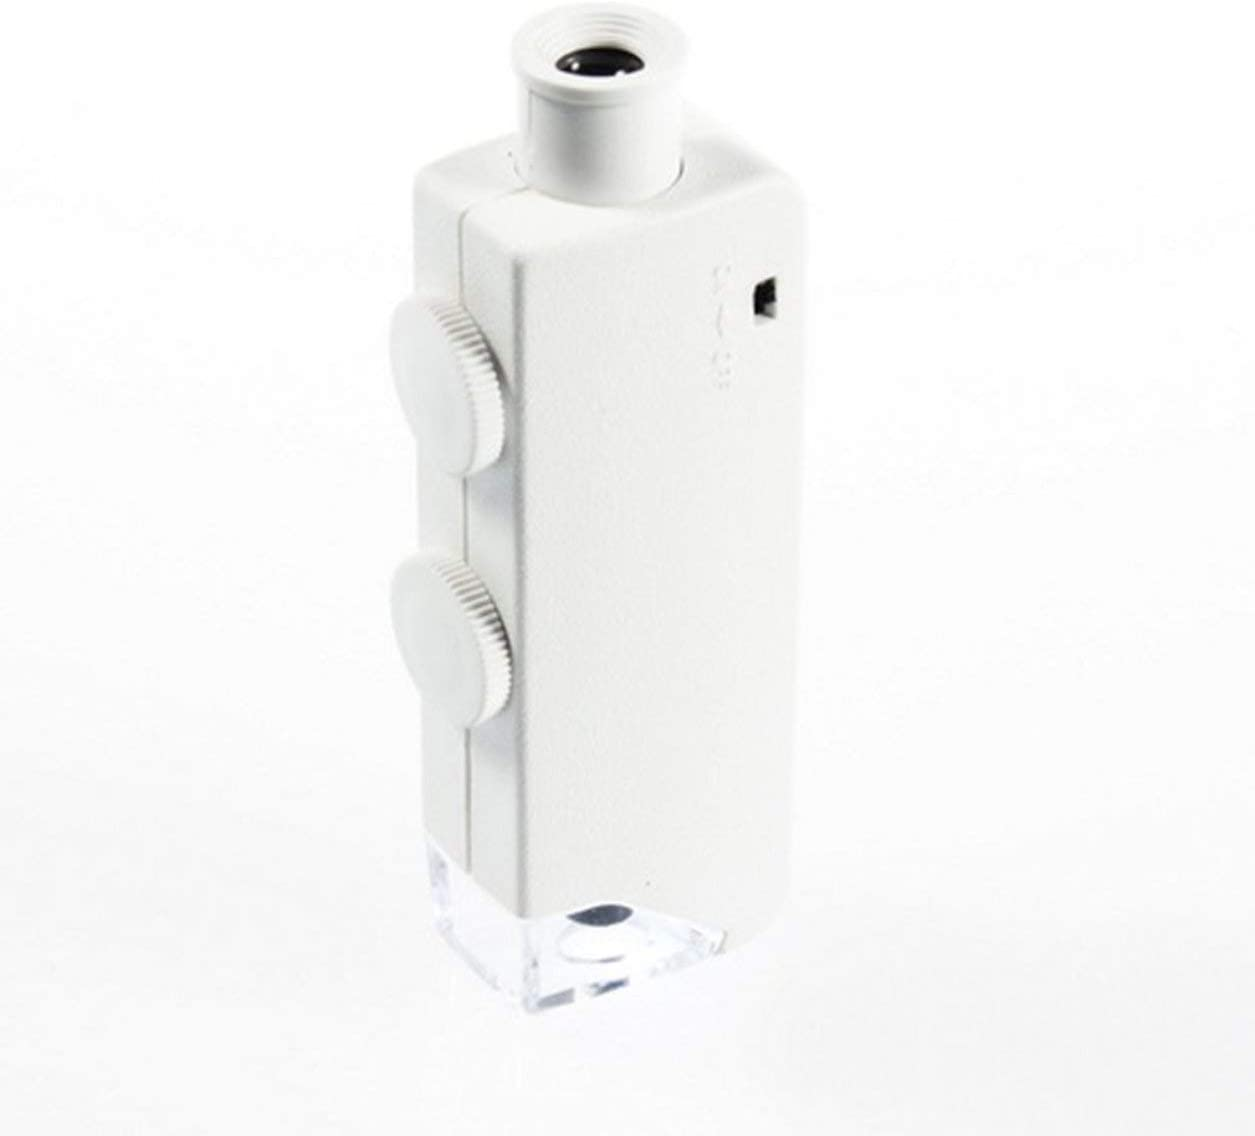 YXDS Microscopio Mini de Mano 160X-200X Ampliaci/ón Zoom len LED L/ámpara de luz iluminada Microscopio de Bolsillo Lupa Lupa